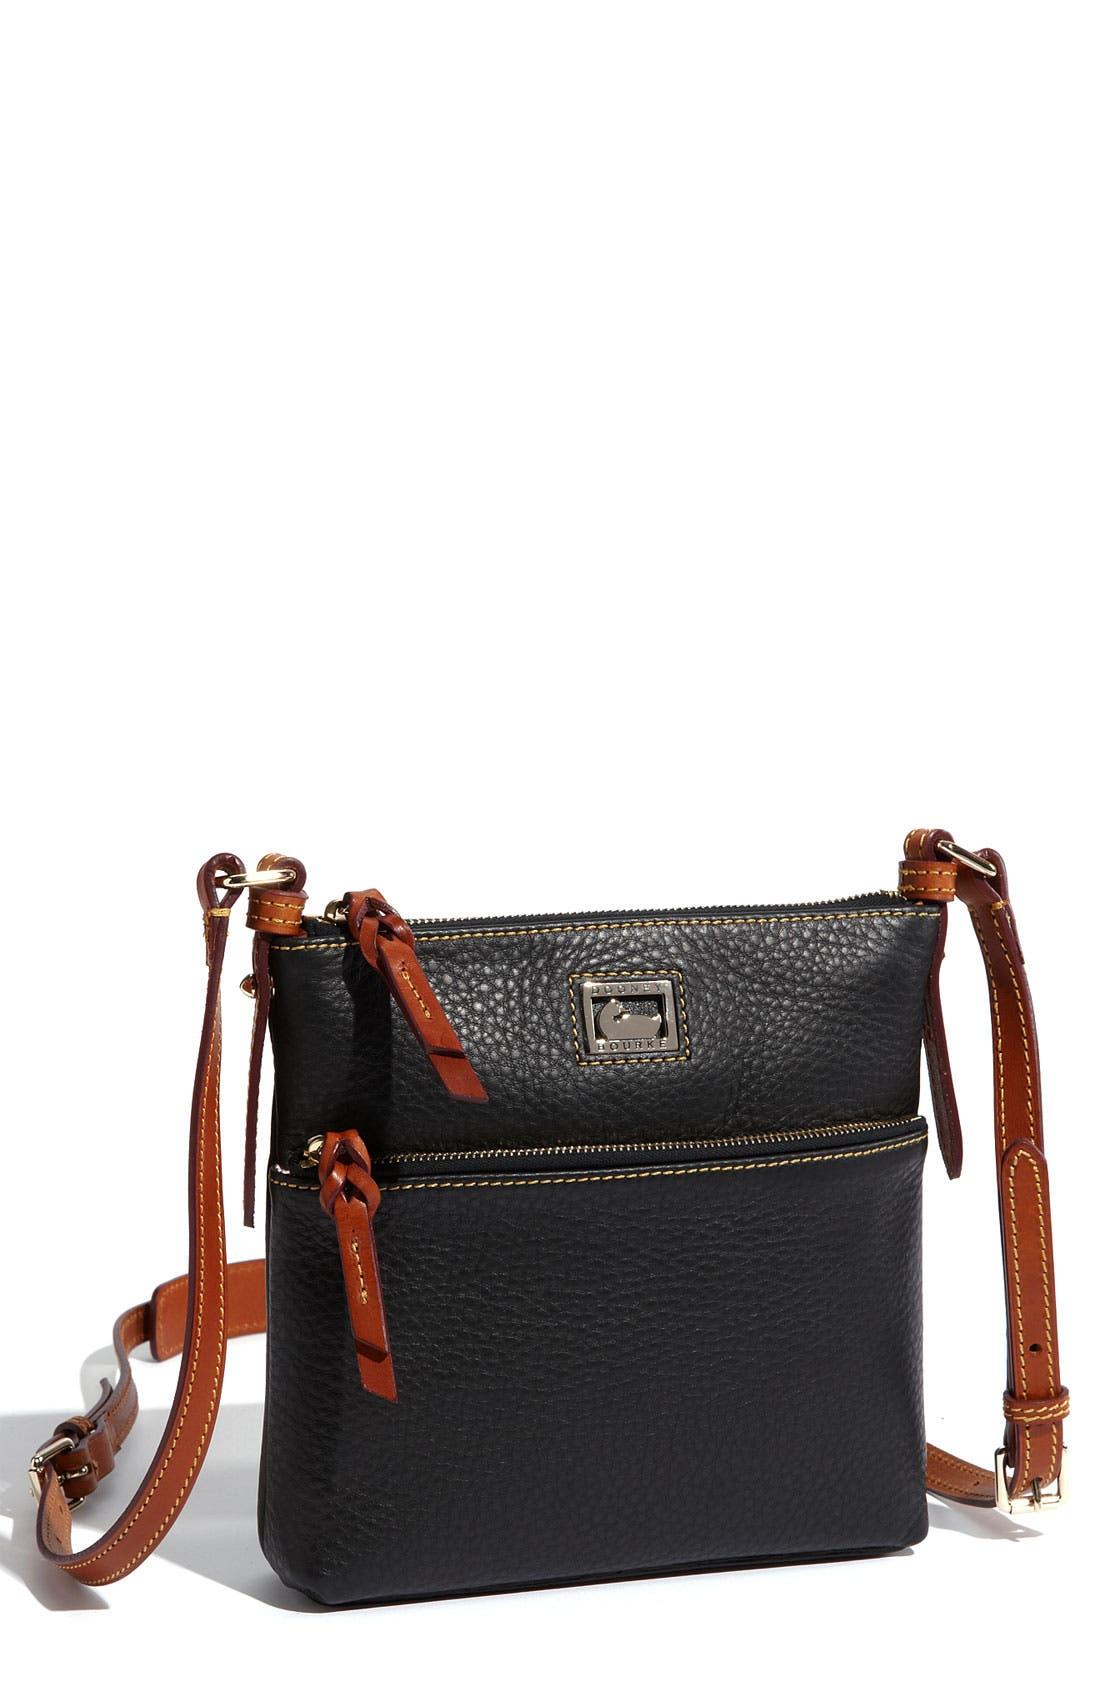 Alternate Image 1 Selected - Dooney & Bourke 'Dillen II Letter Carrier' Crossbody Bag (Online Only)